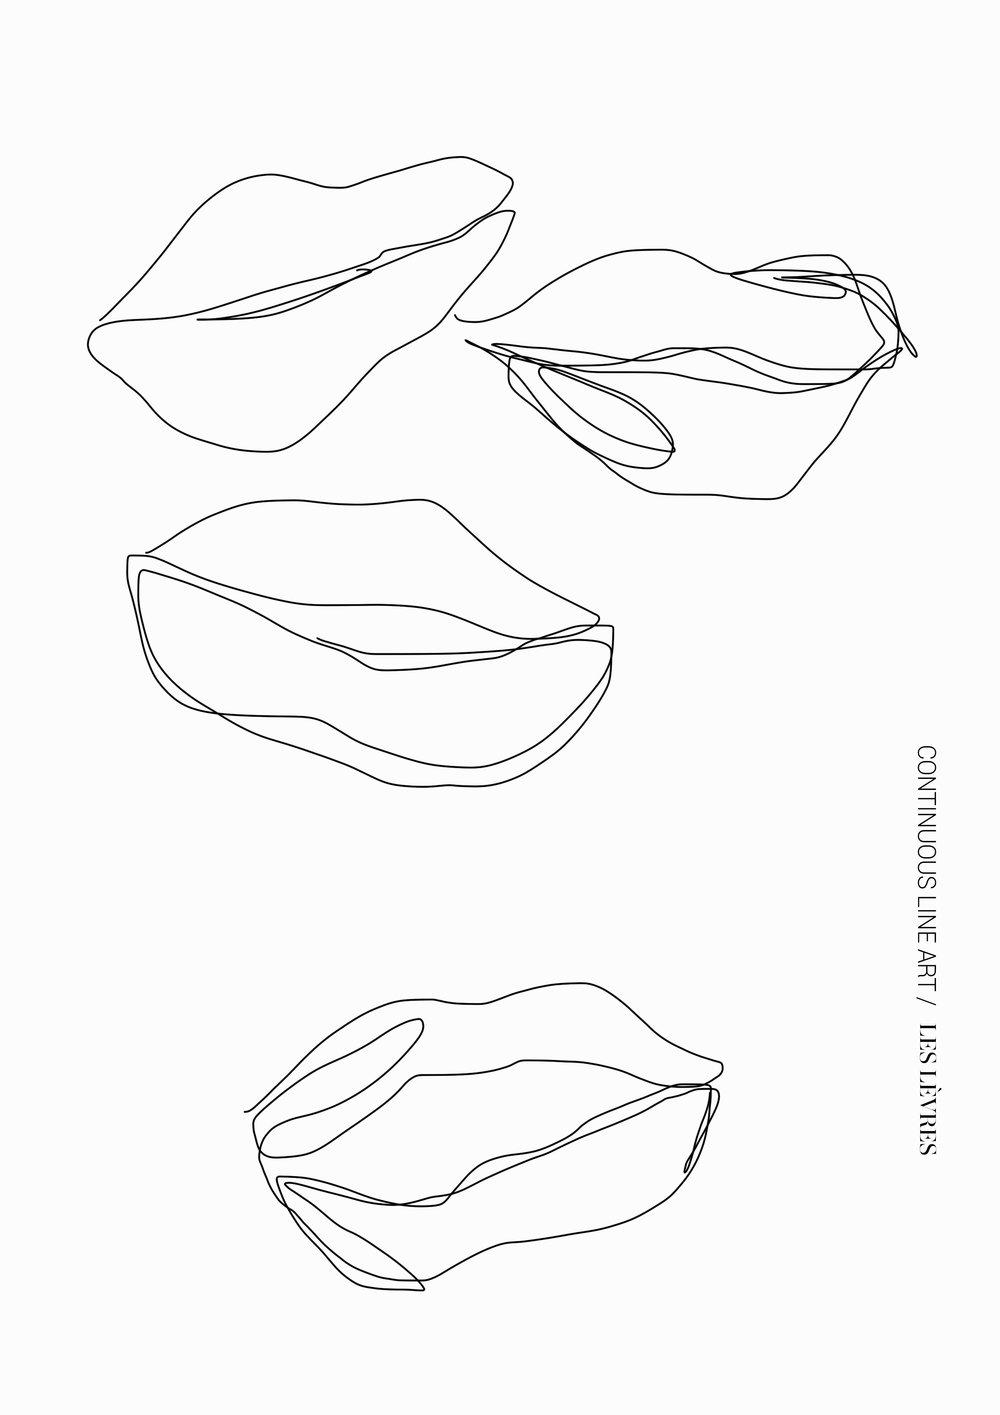 rebecca+allen+continuous+line+art+lips.jpg